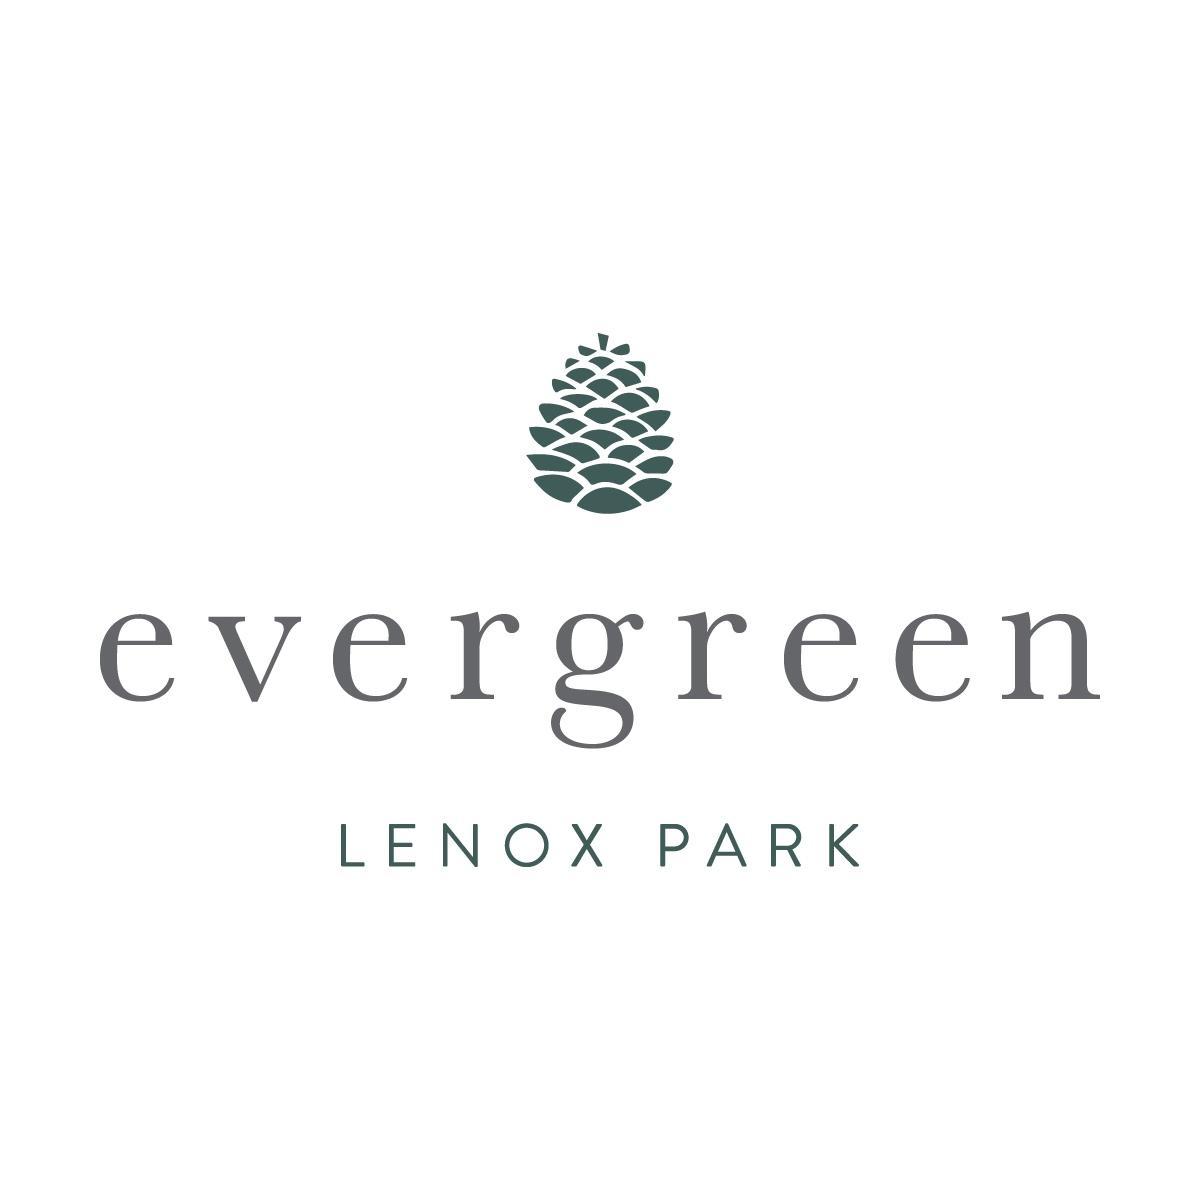 Evergreen Lenox Park